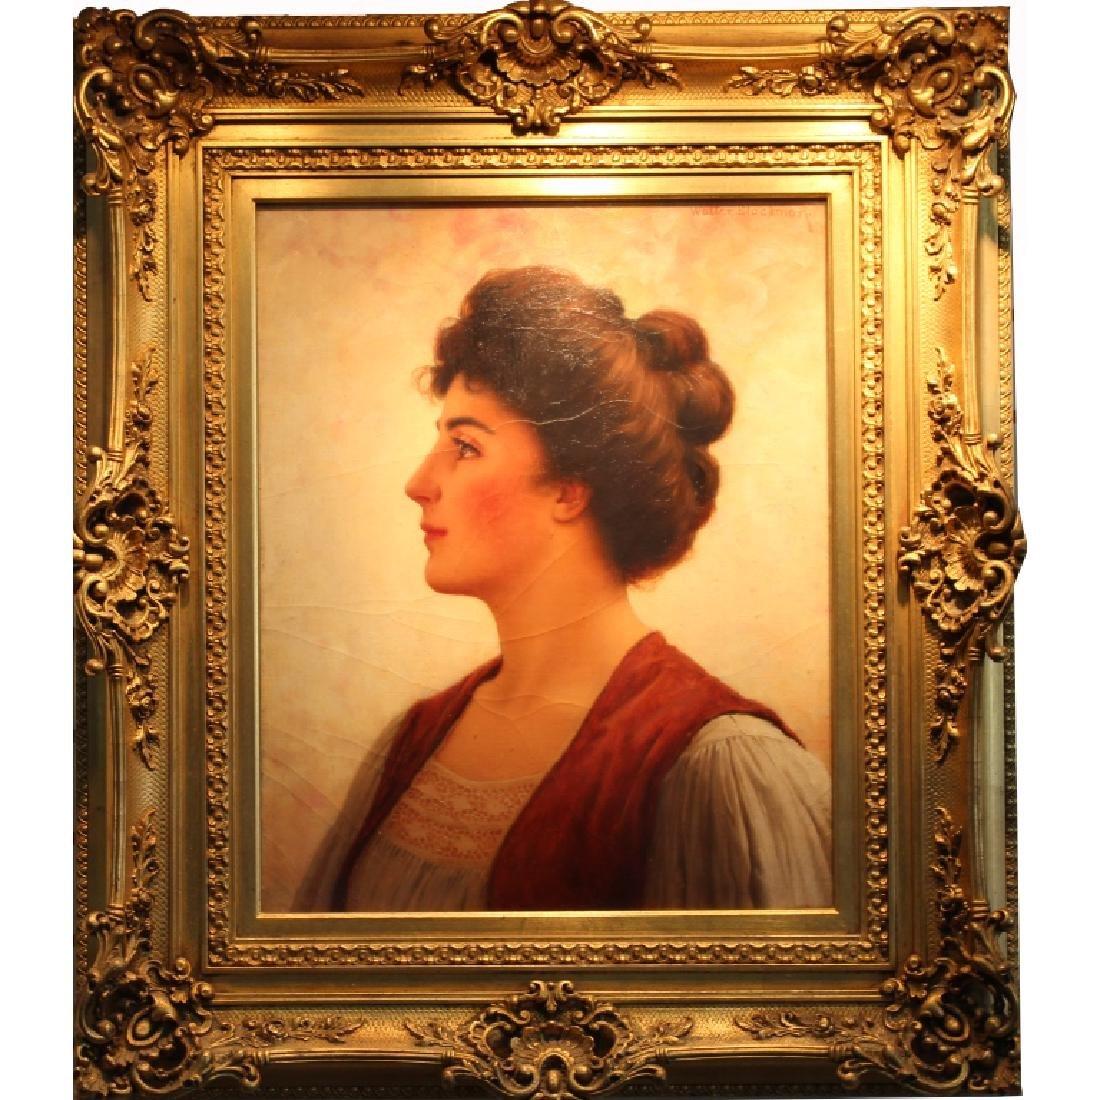 Walter Blackman (1847-1928) Portrait of a Female